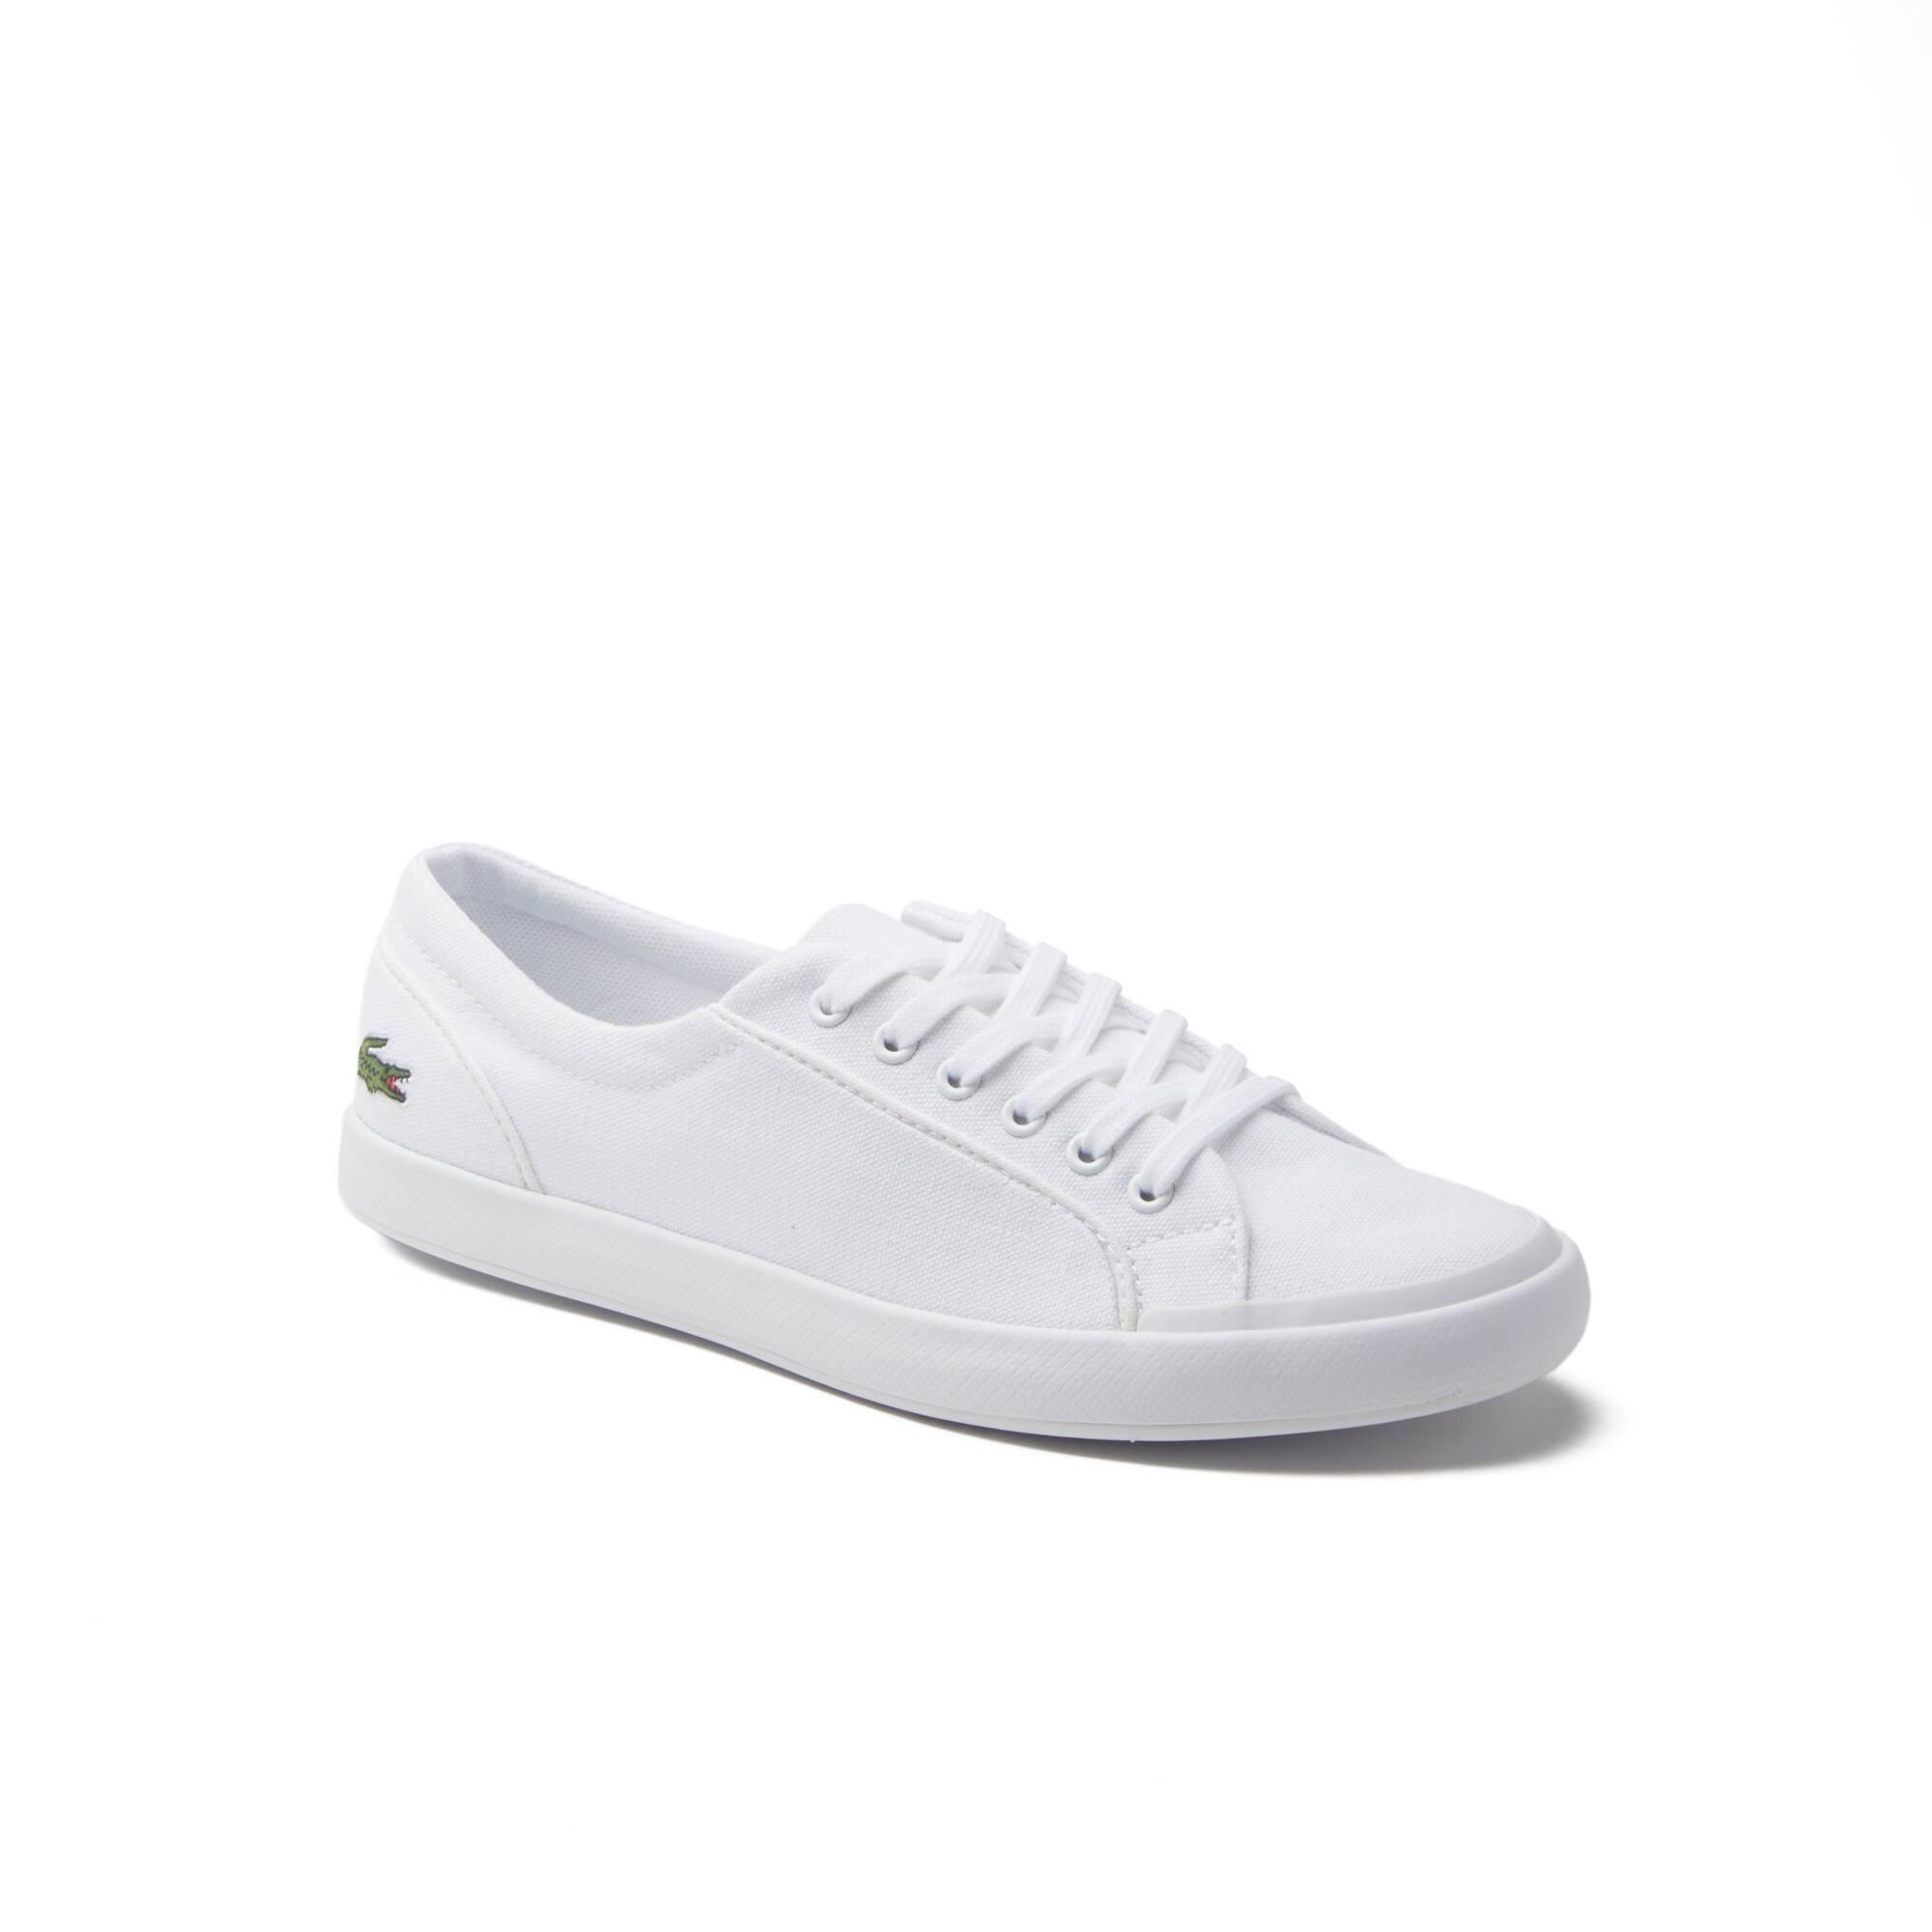 Sneakers basse Lancelle in tela